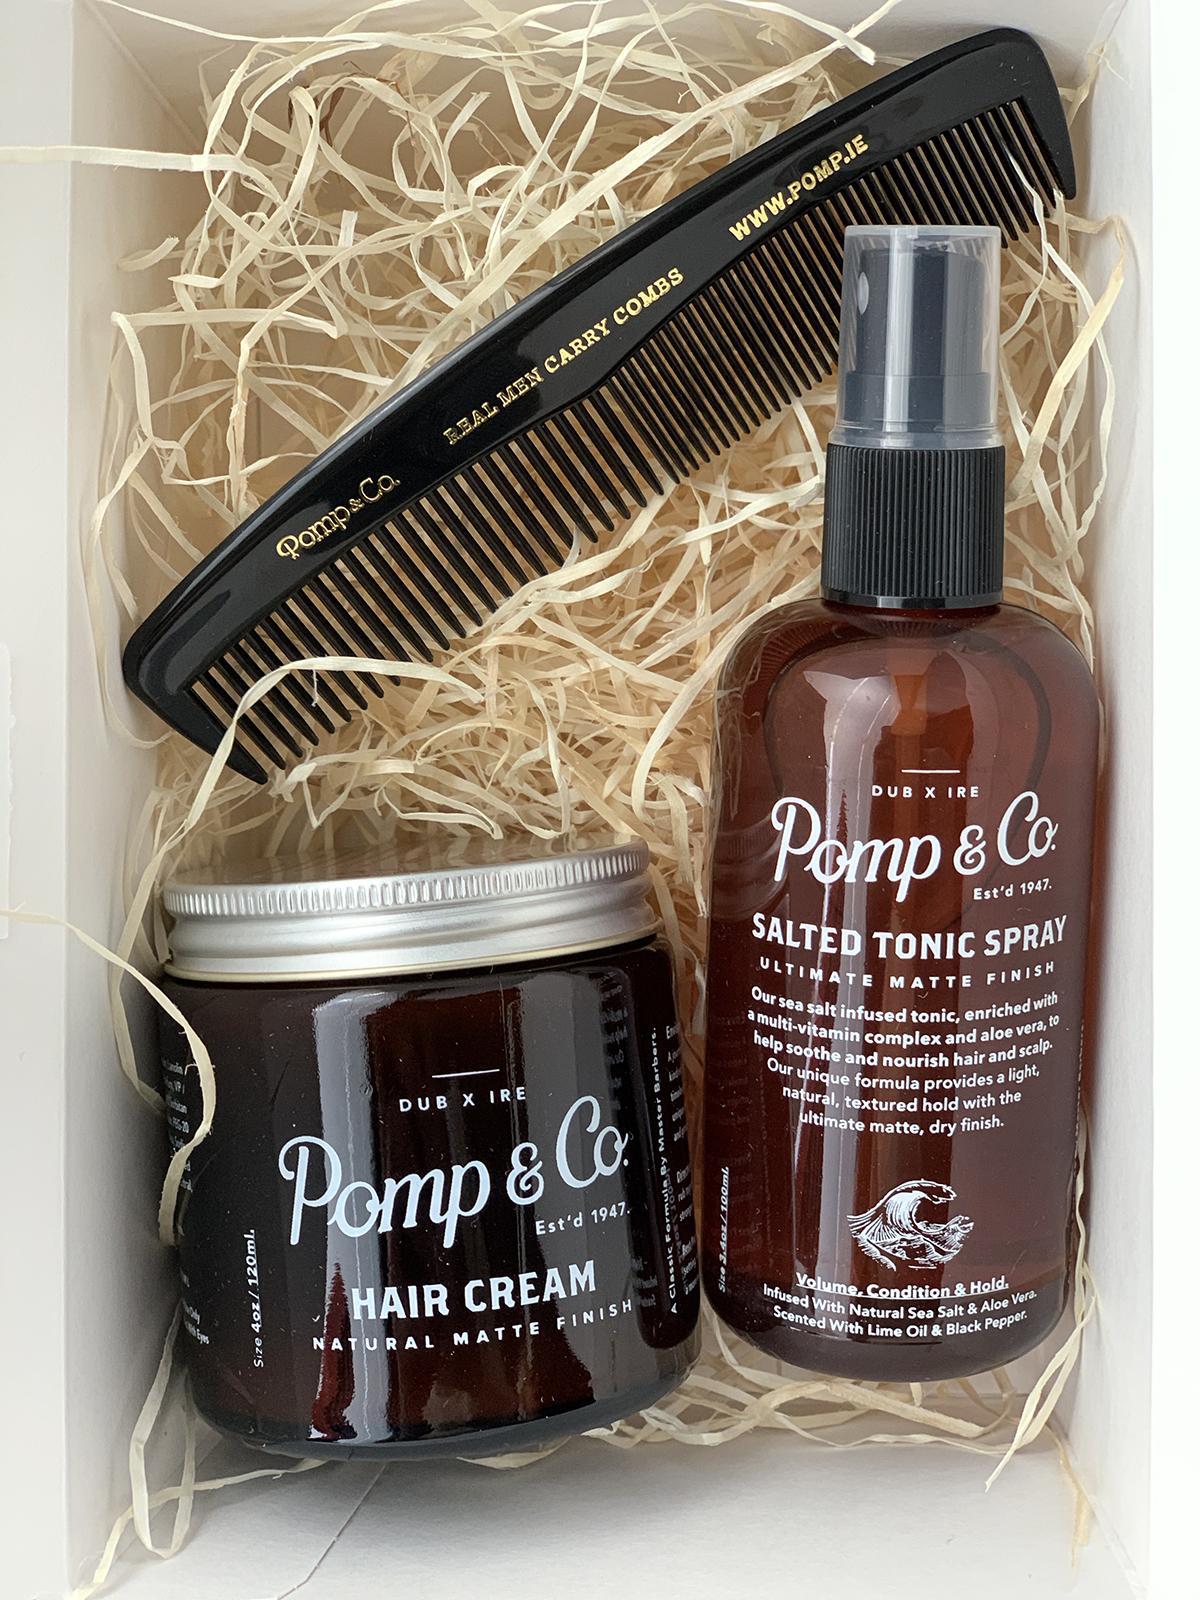 Tuotekuva: Pomp&Co. -lahjasetti Hair Cream & Tonic Spray suolasuihke